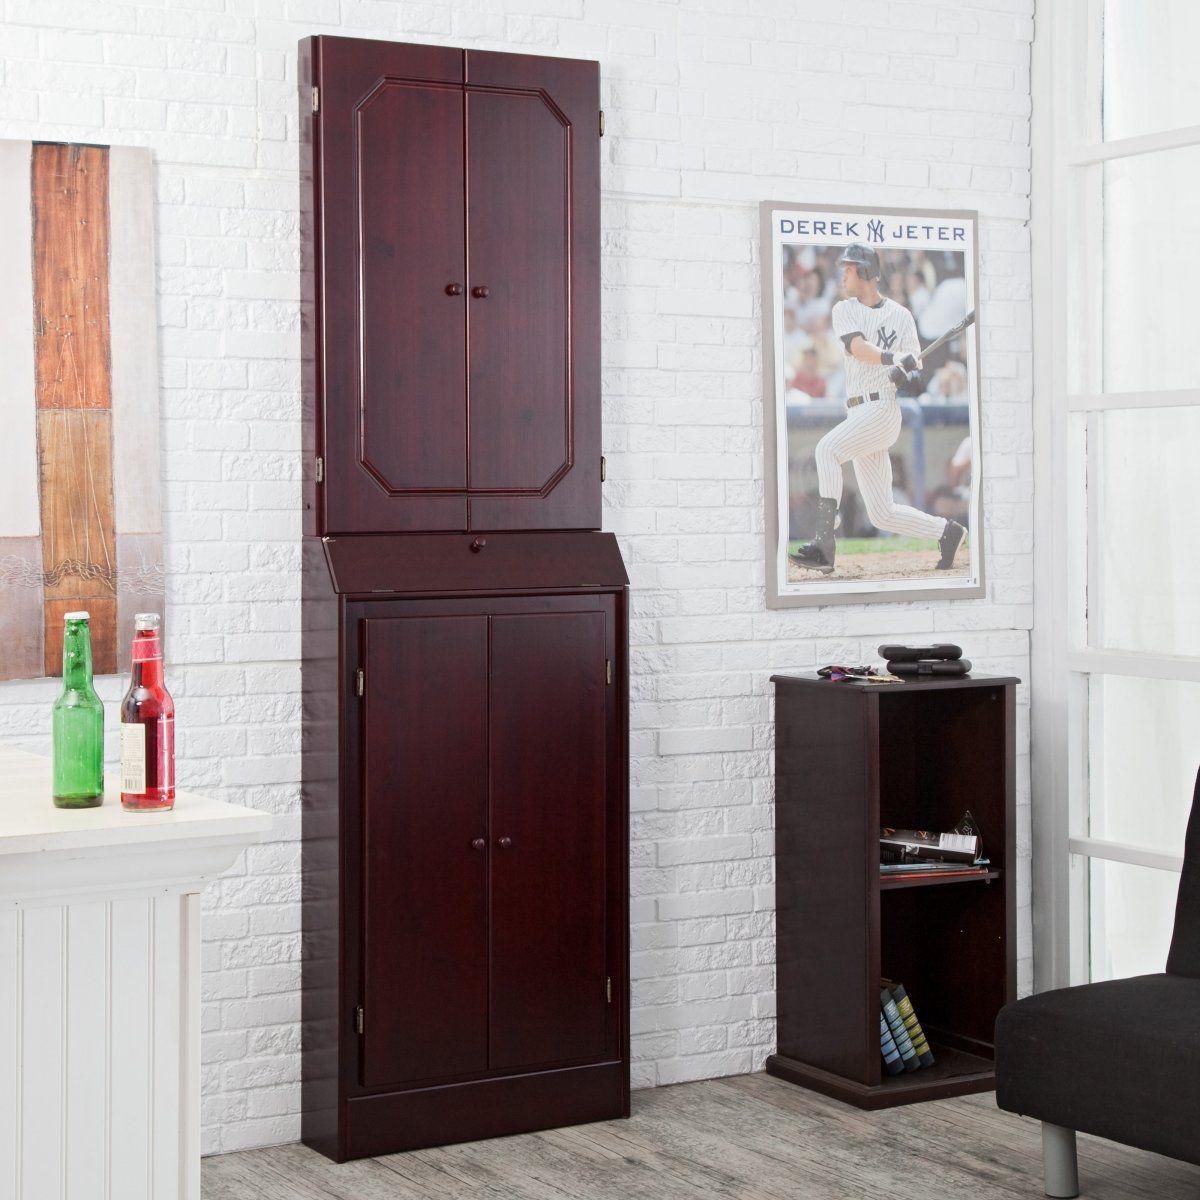 Upper Kitchen Cabinet Woodworking Plans: Worcester Arcade Style Dart Board Cabinet